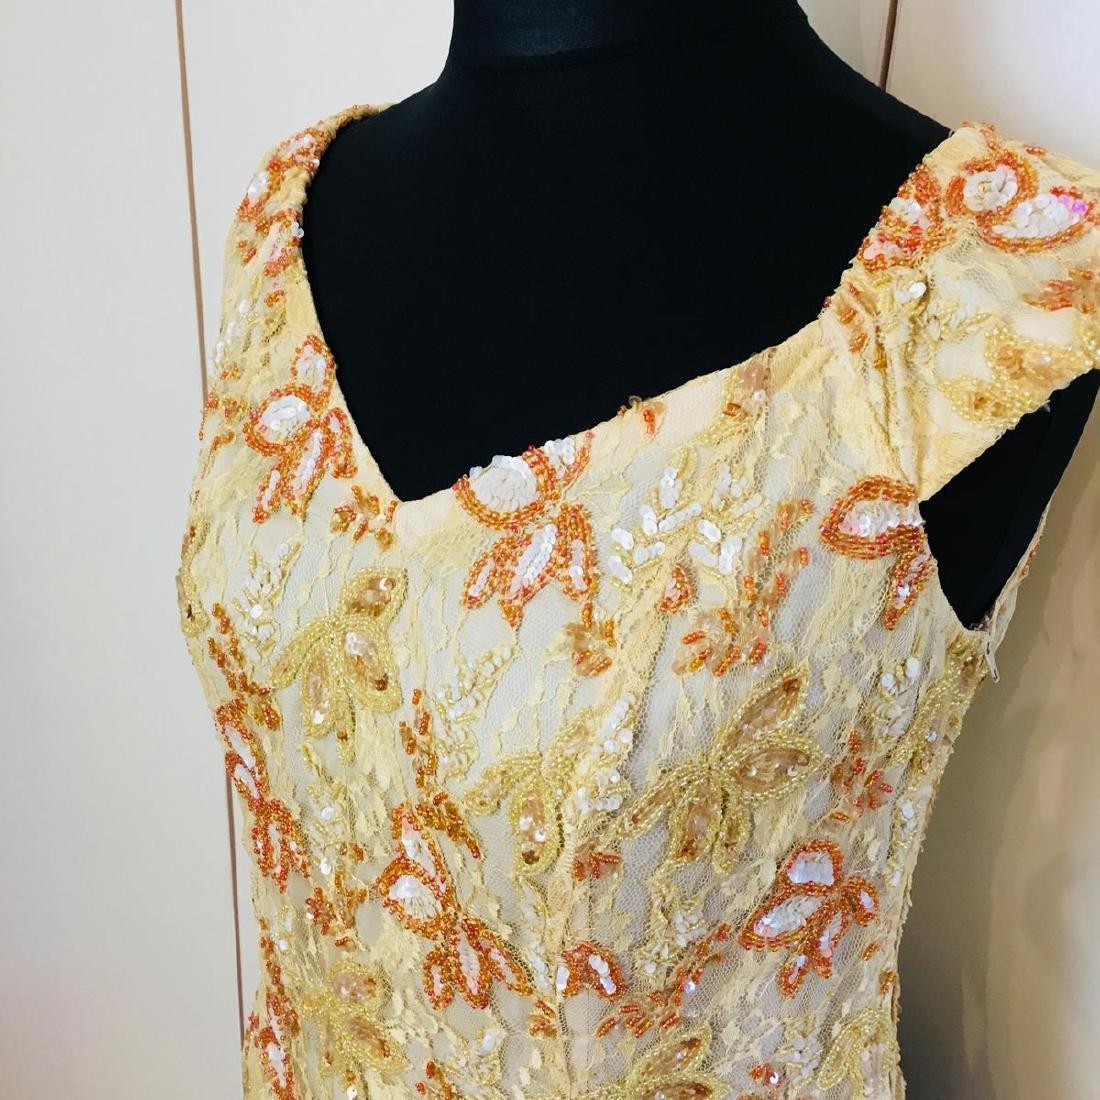 Vintage Women's Collection Designer Blouse Shirt Top - 2